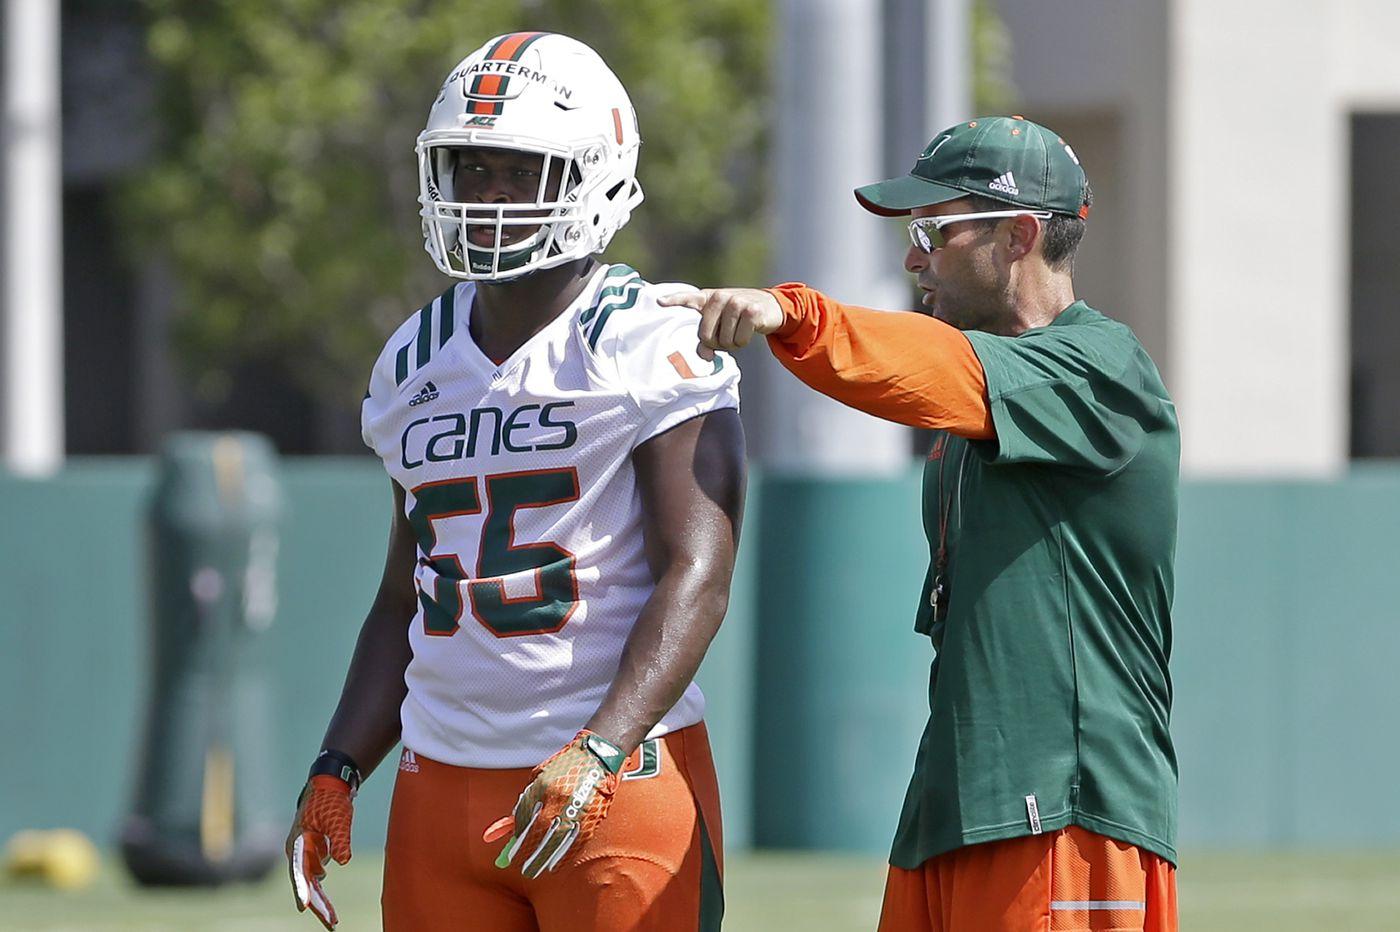 Temple hires Miami's Manny Diaz as its football coach